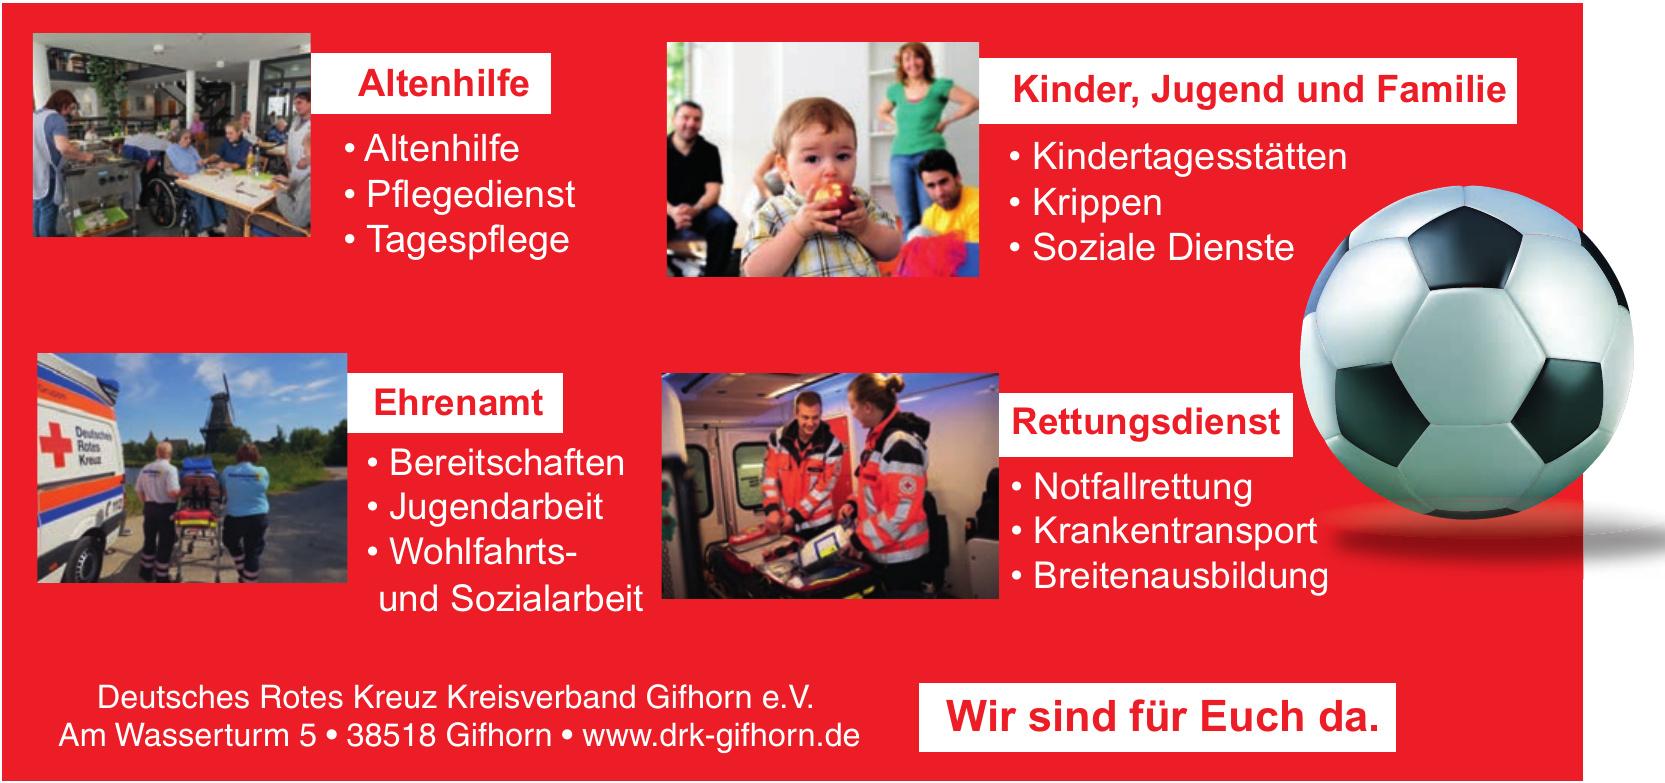 Deutsches Rotes Kreuz Kreisverband Gifhorn e.V.